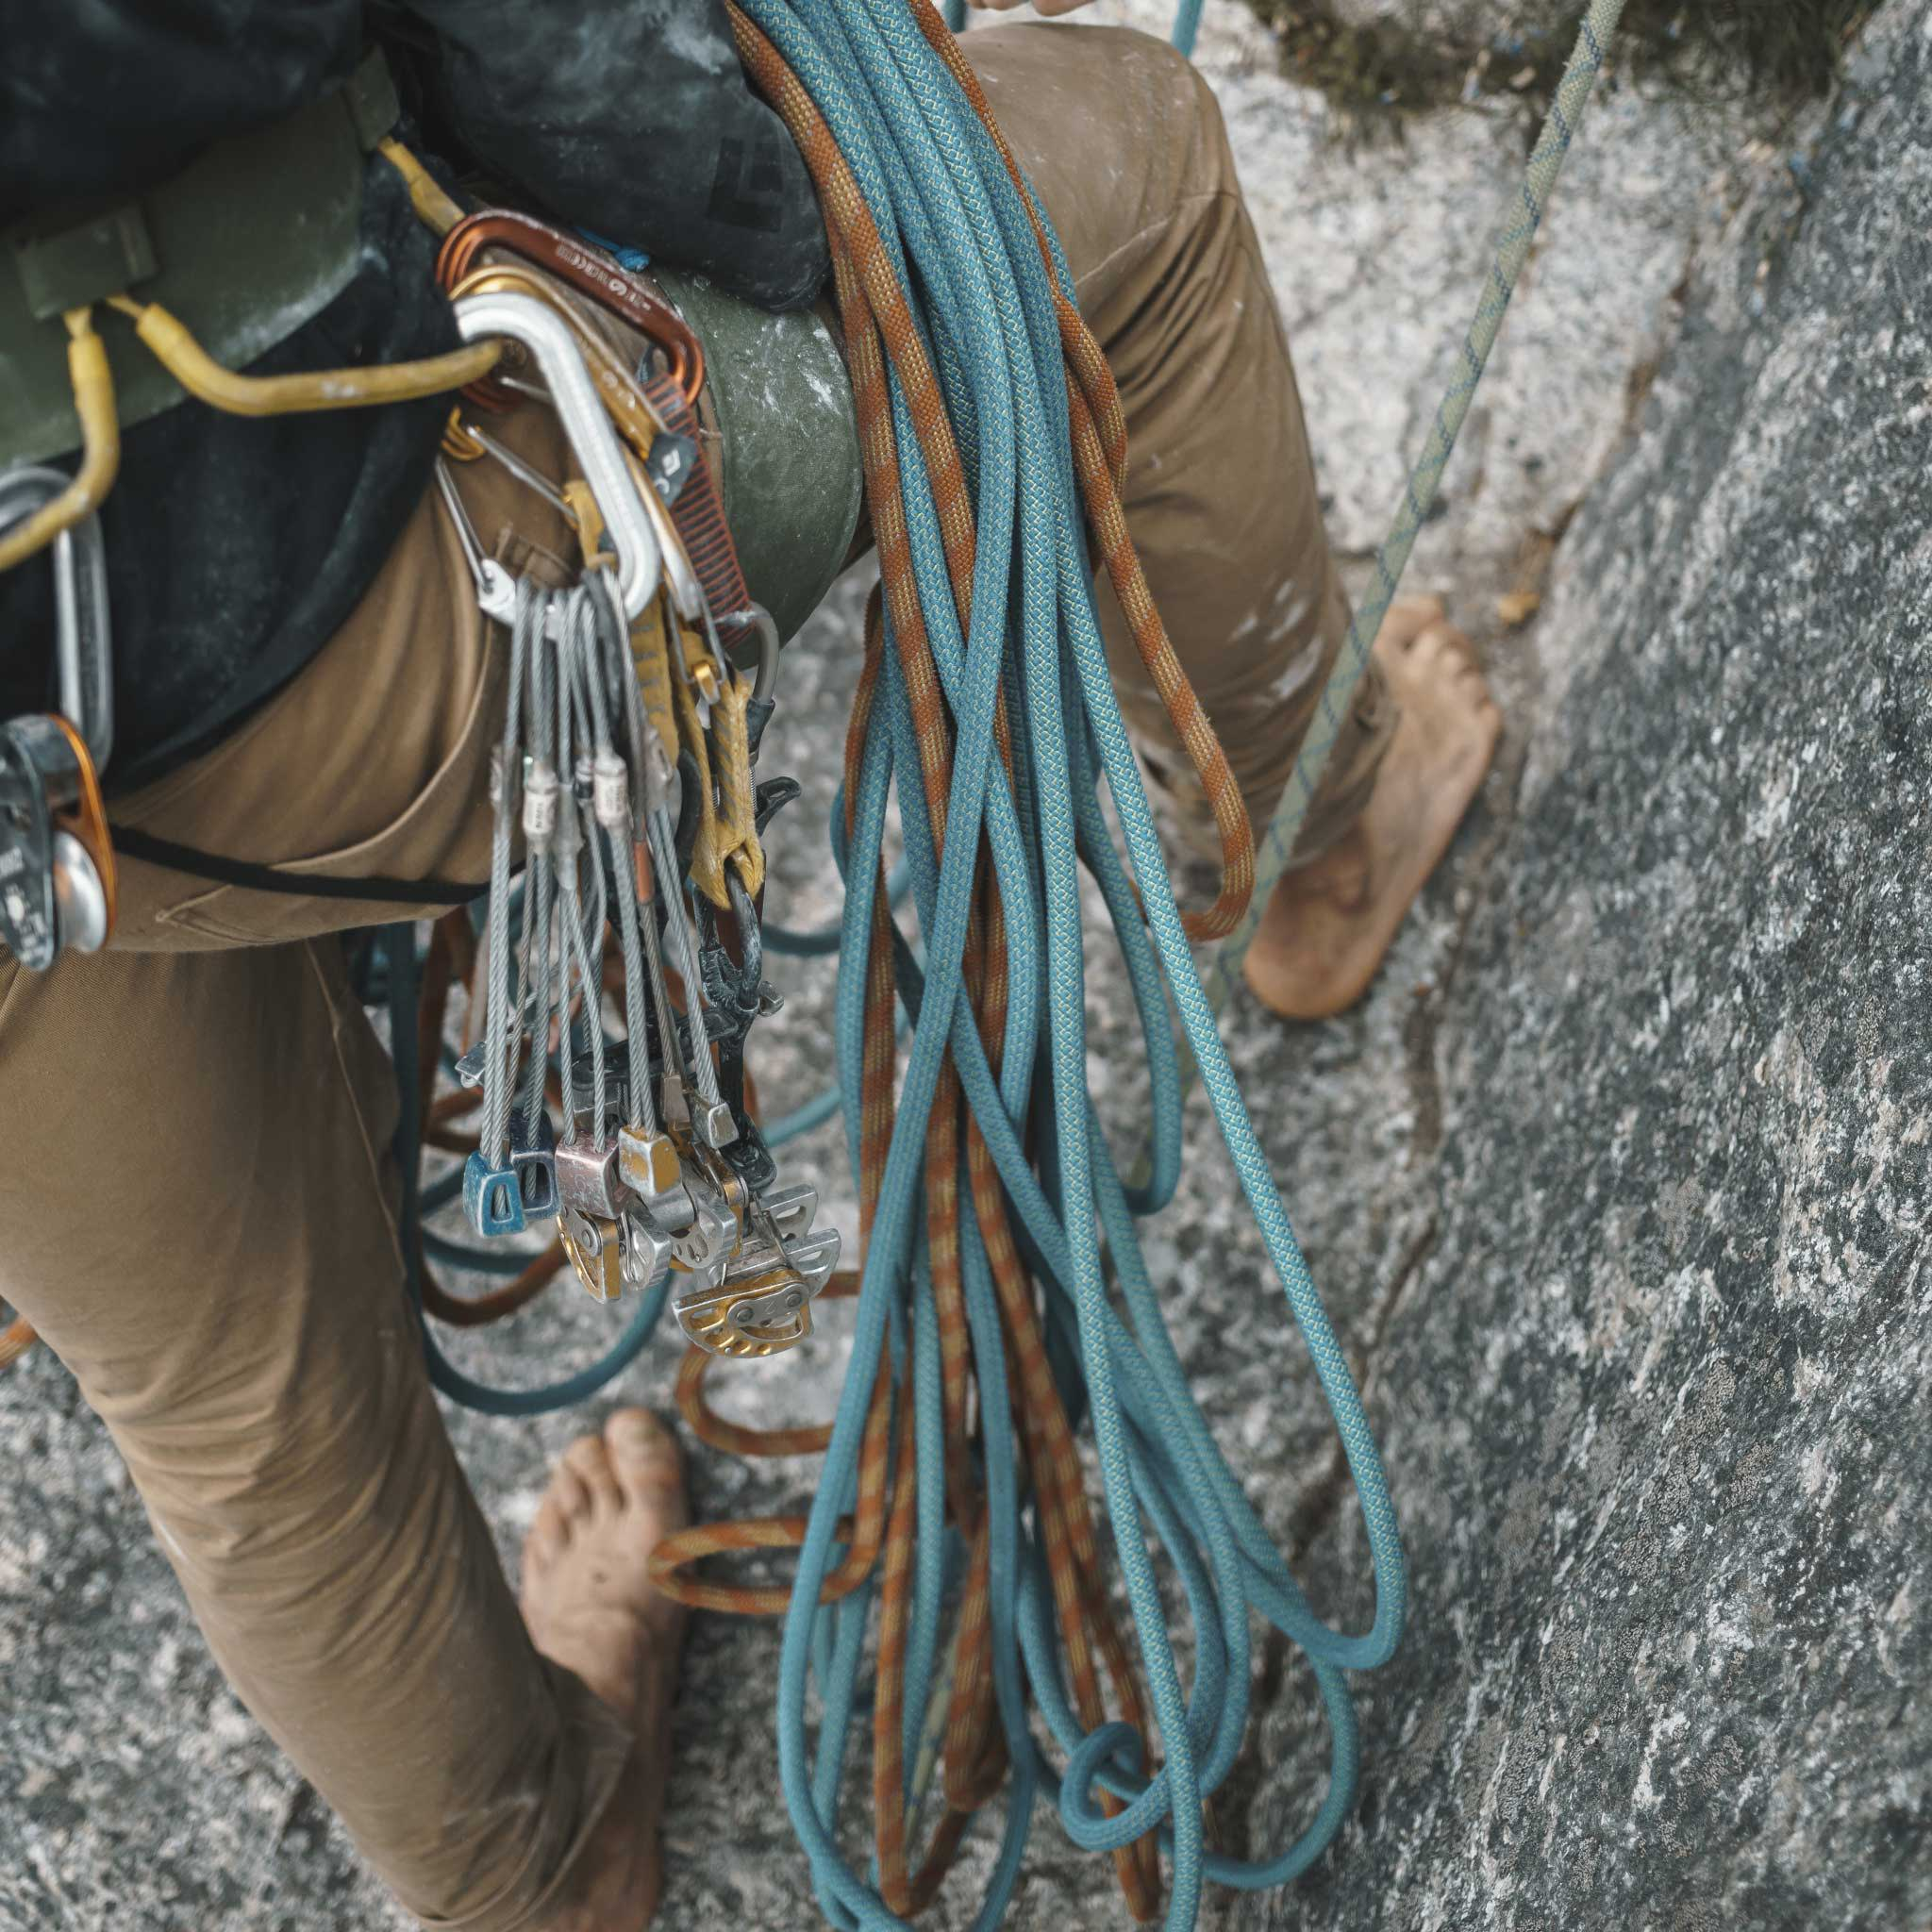 Man belaying rock climber while wearing Nelson Pant